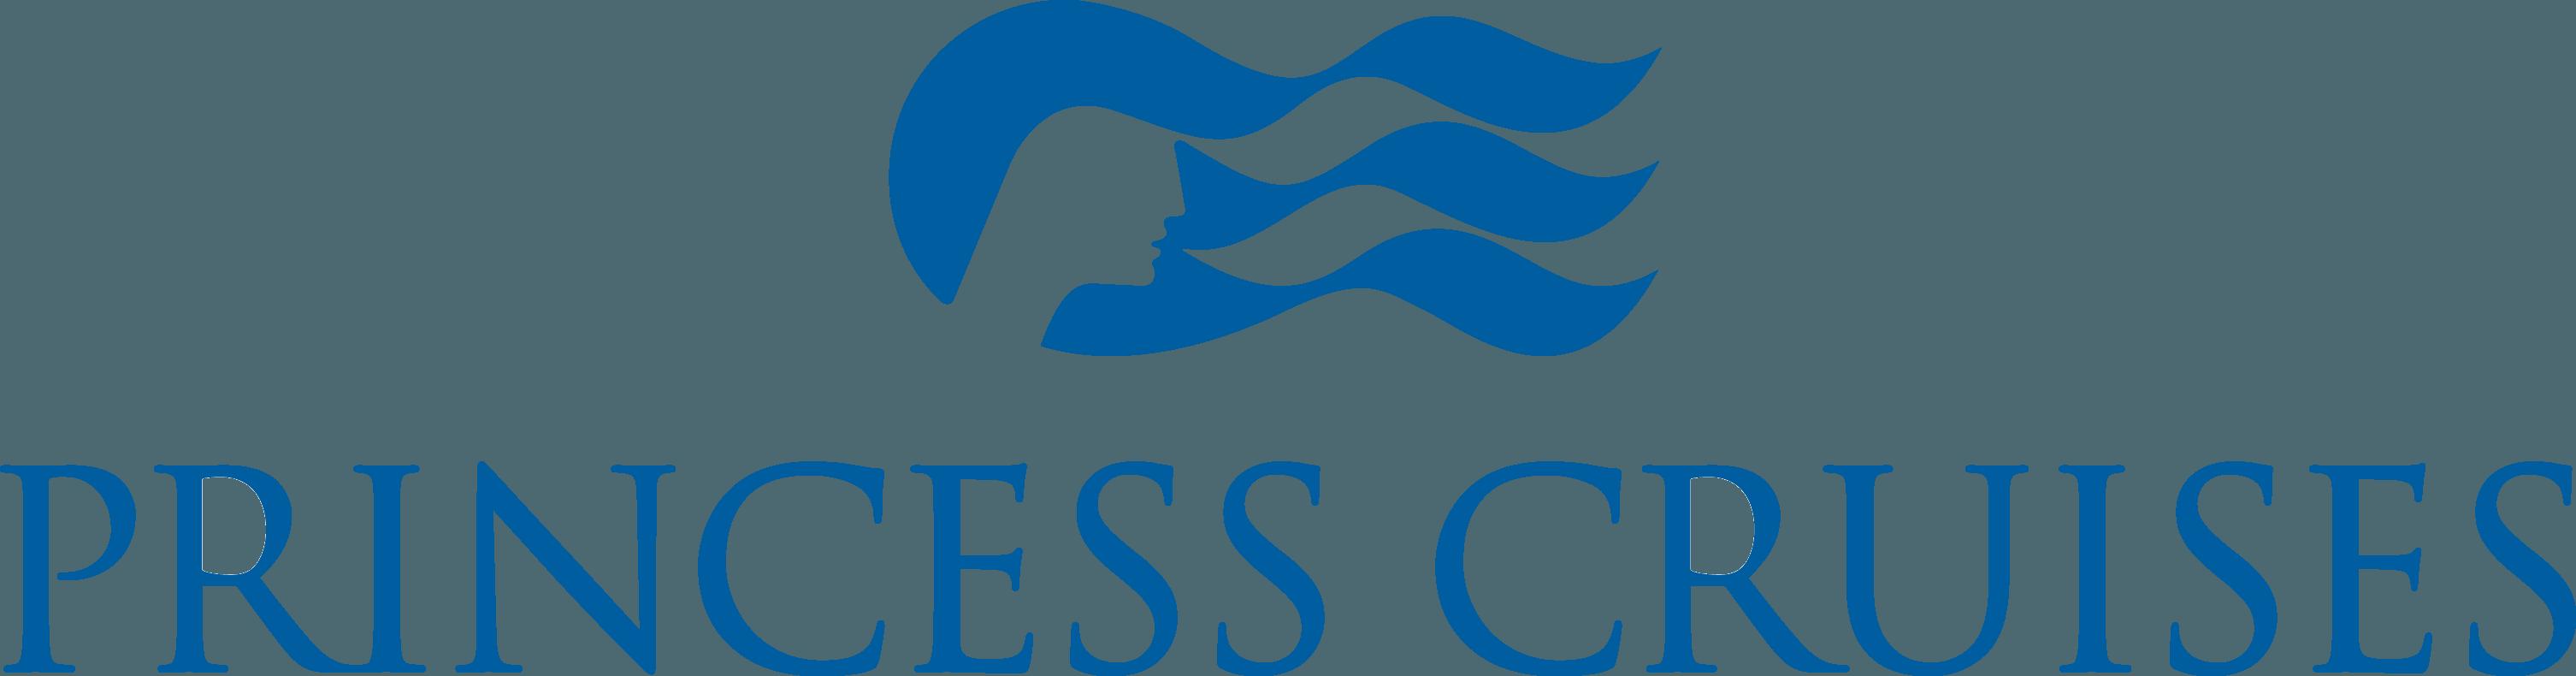 Princess Cruises Logo png